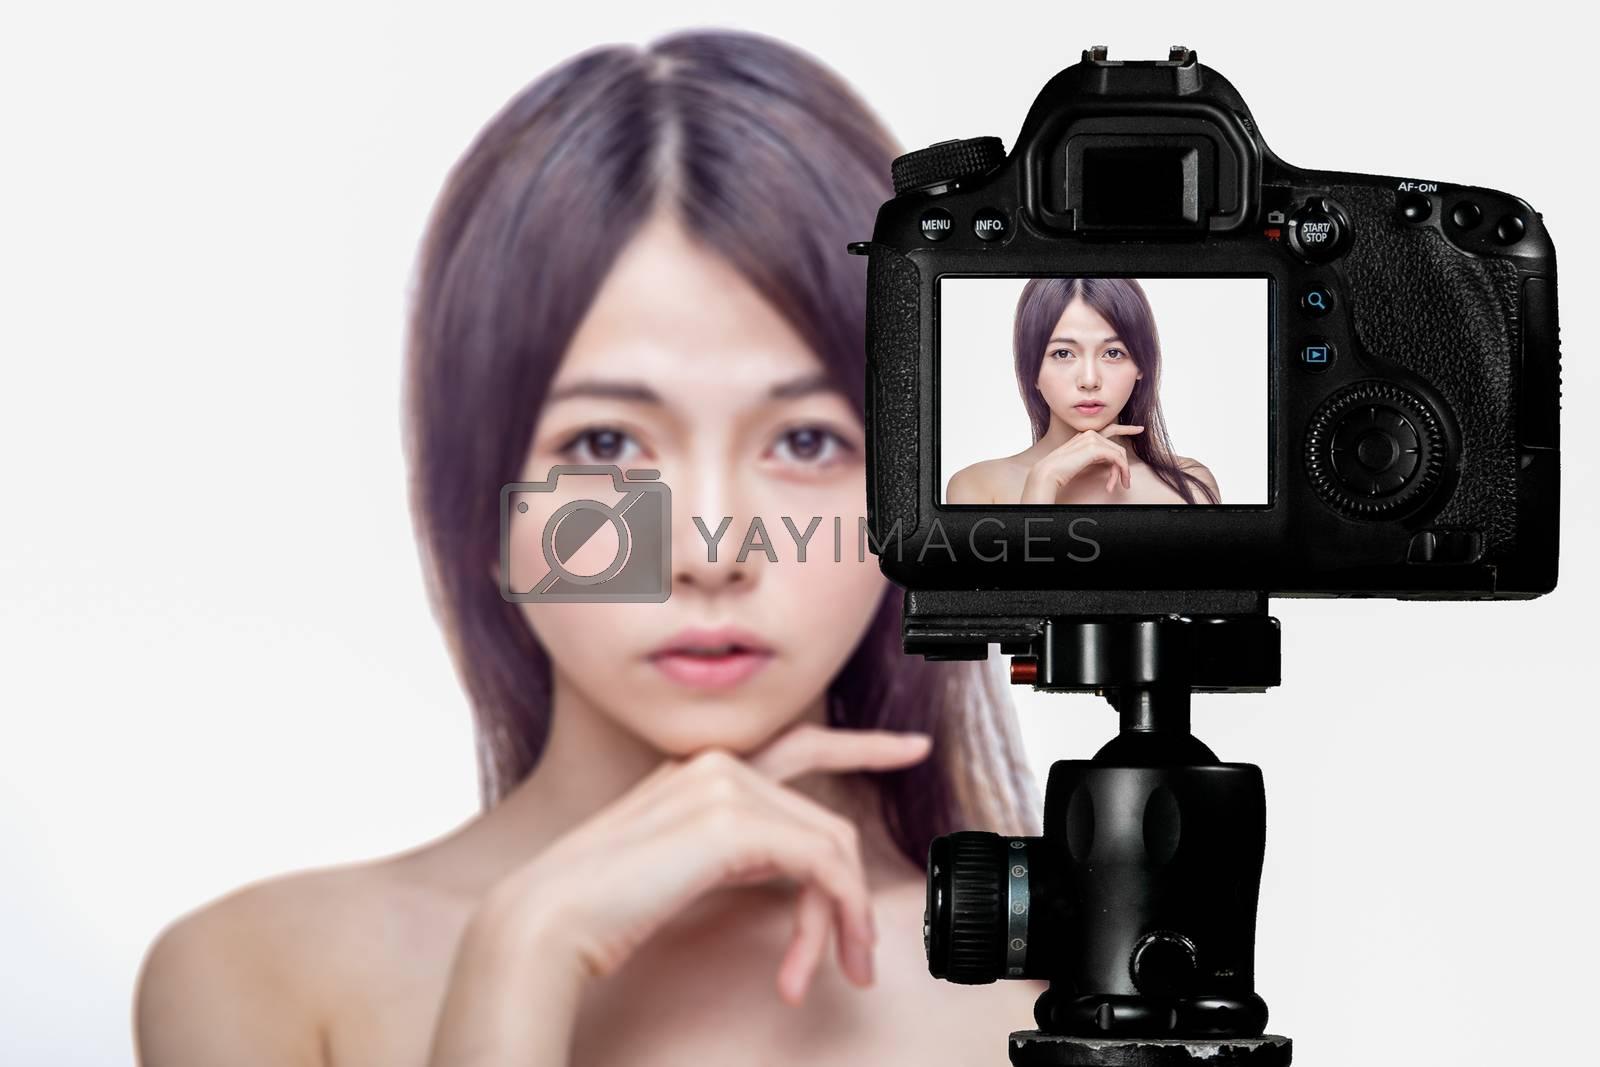 Asian American beauty vlogger creating content for social media vlog, behind camera shot